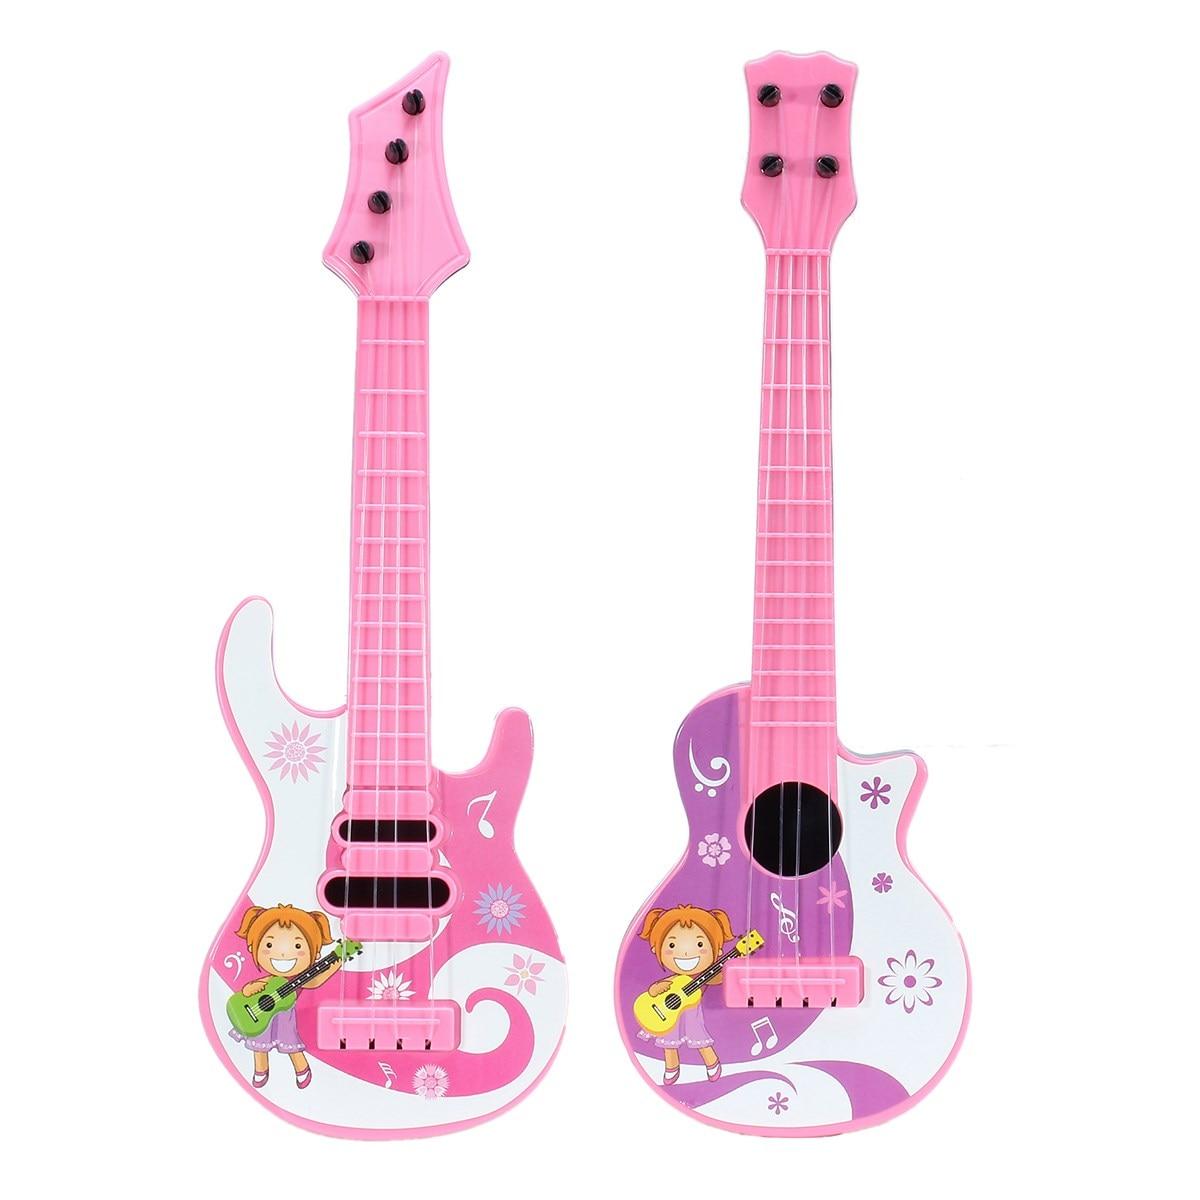 Diseño De Dibujos Animados De Moda Plástico Guitarras Juguete Mini Instrumento Musical Educatonal Juguetes Para Niños Bebé Niños Juguete Musical